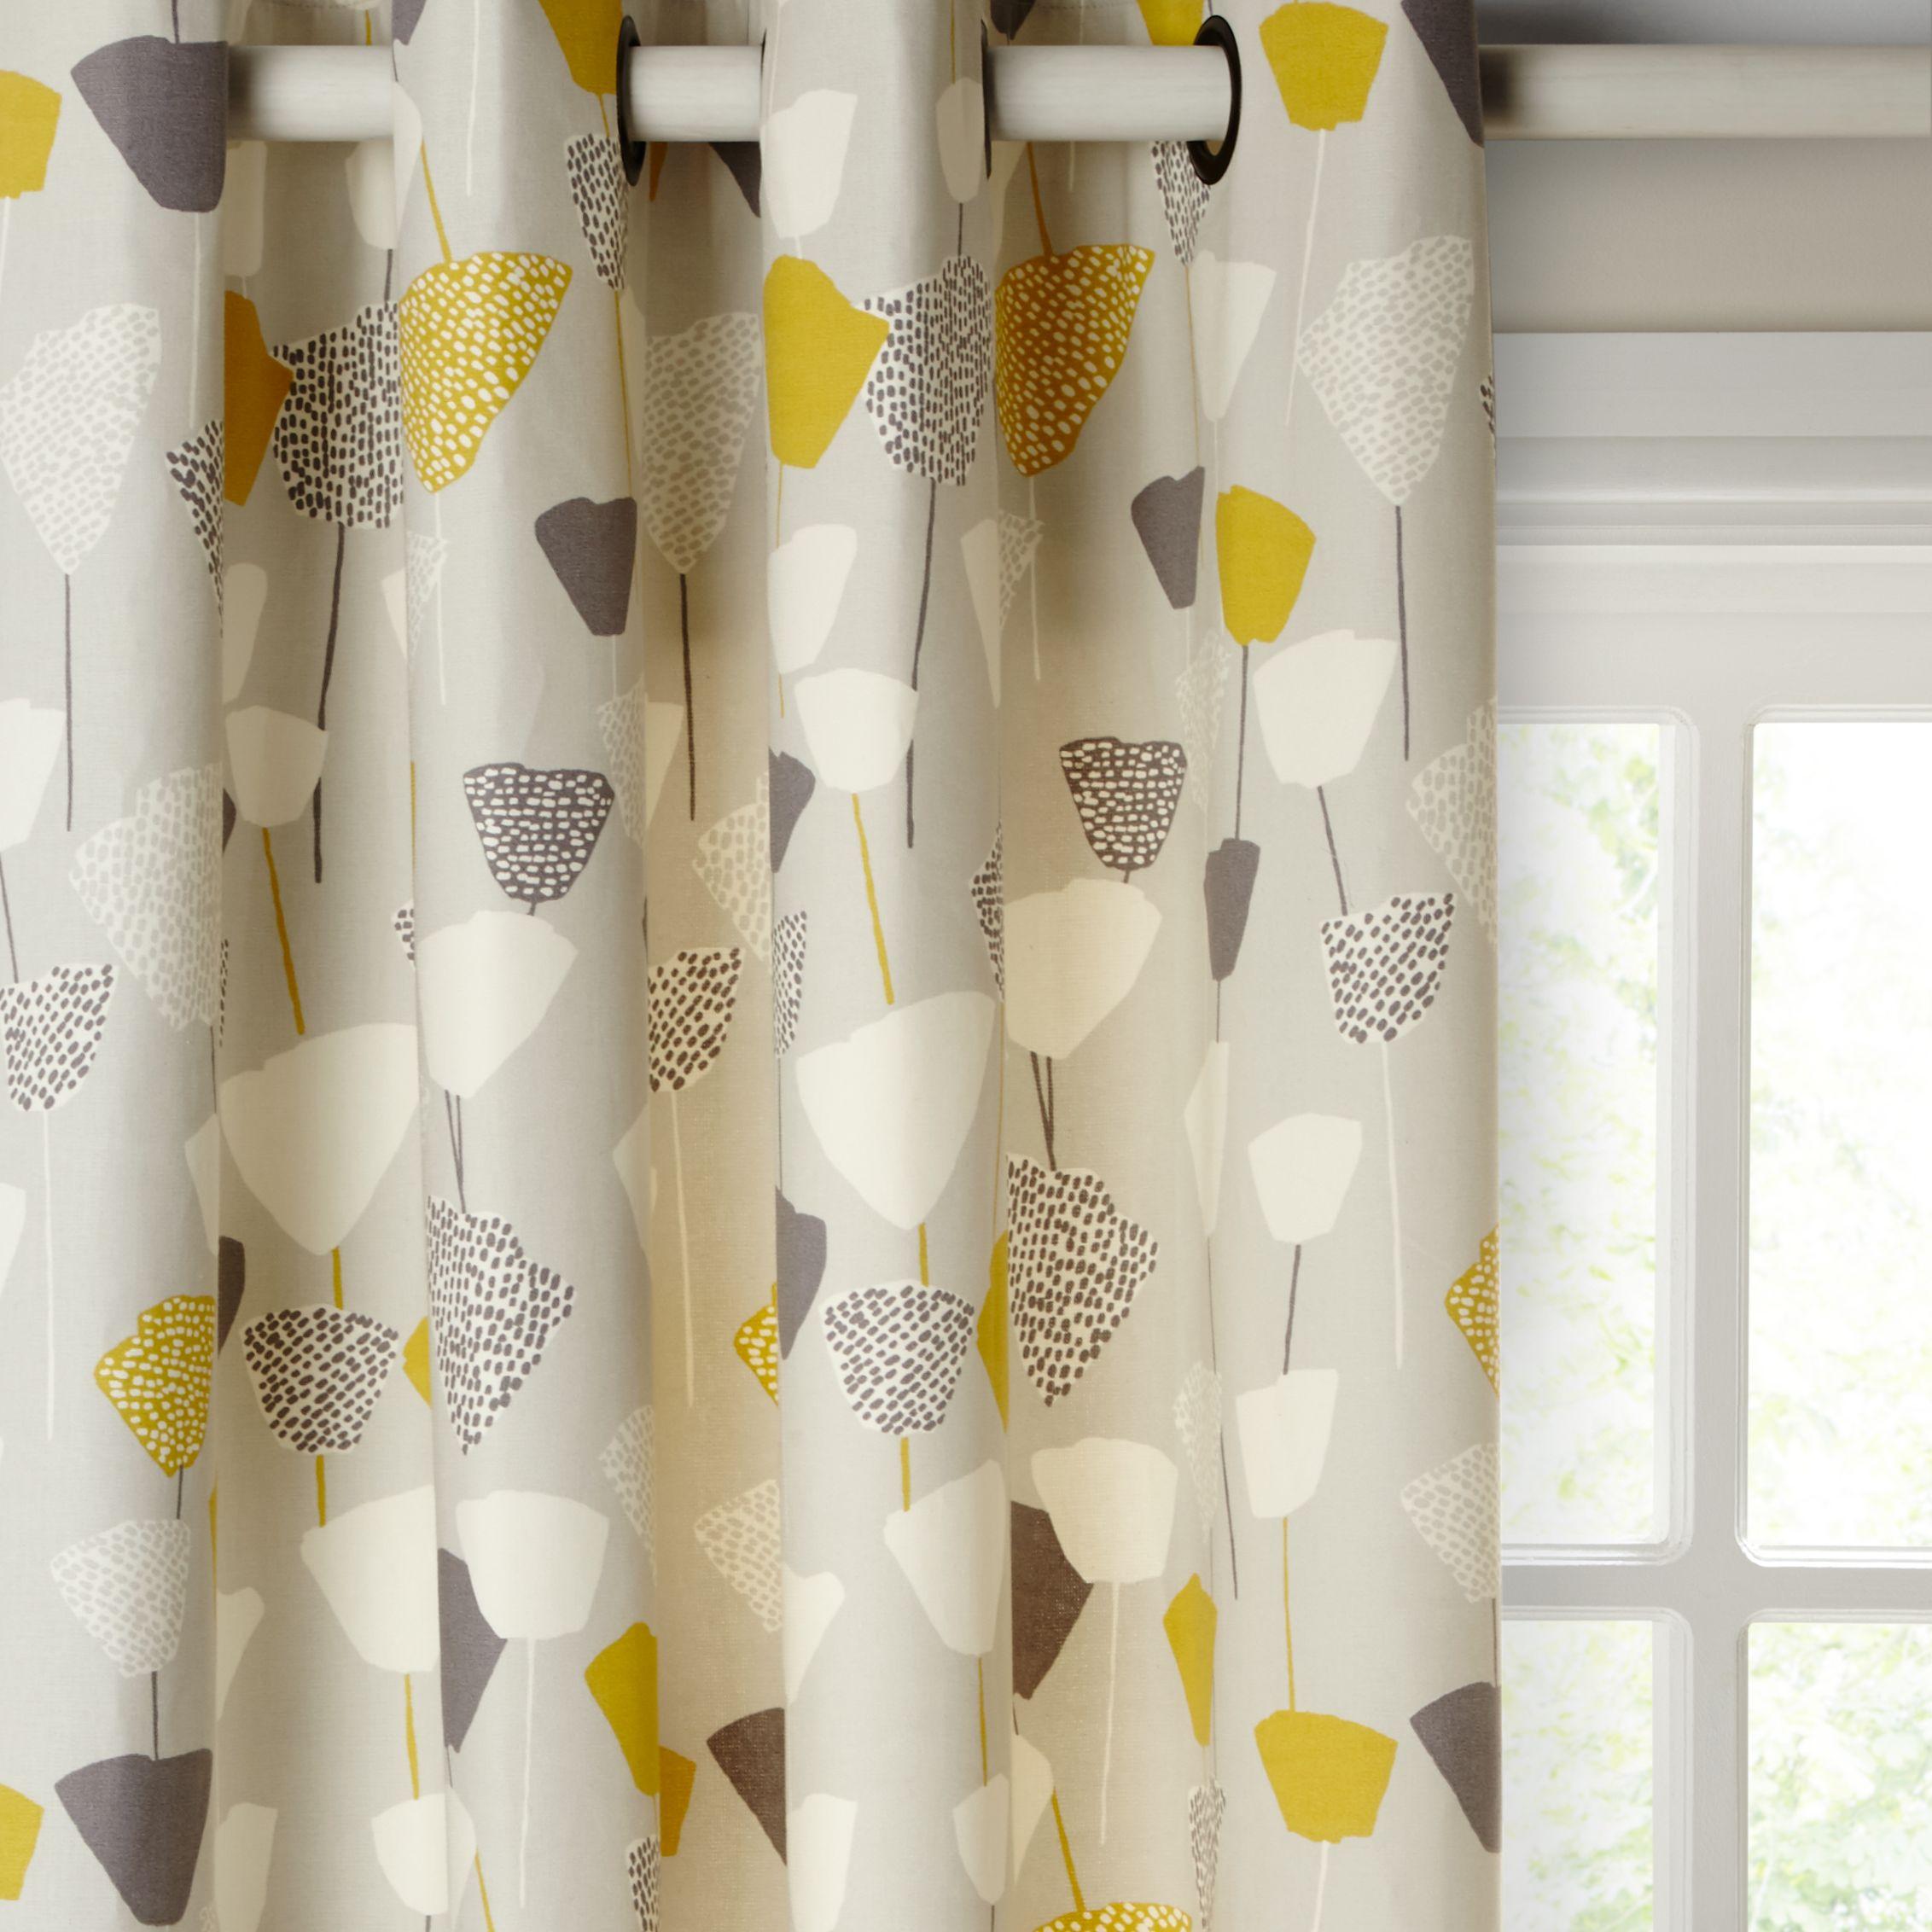 Grey and yellow curtains uk john lewis - Grey And Yellow Curtains Uk John Lewis 21